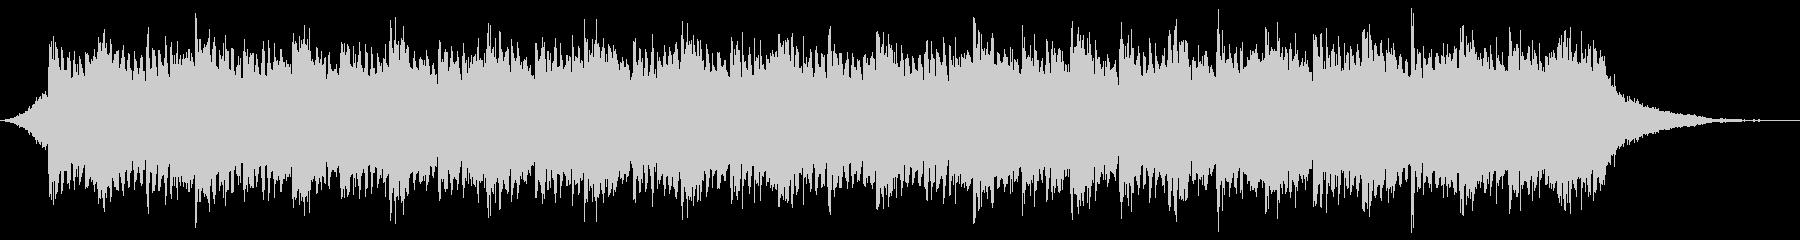 Cinematic Piano&Strings 3の未再生の波形